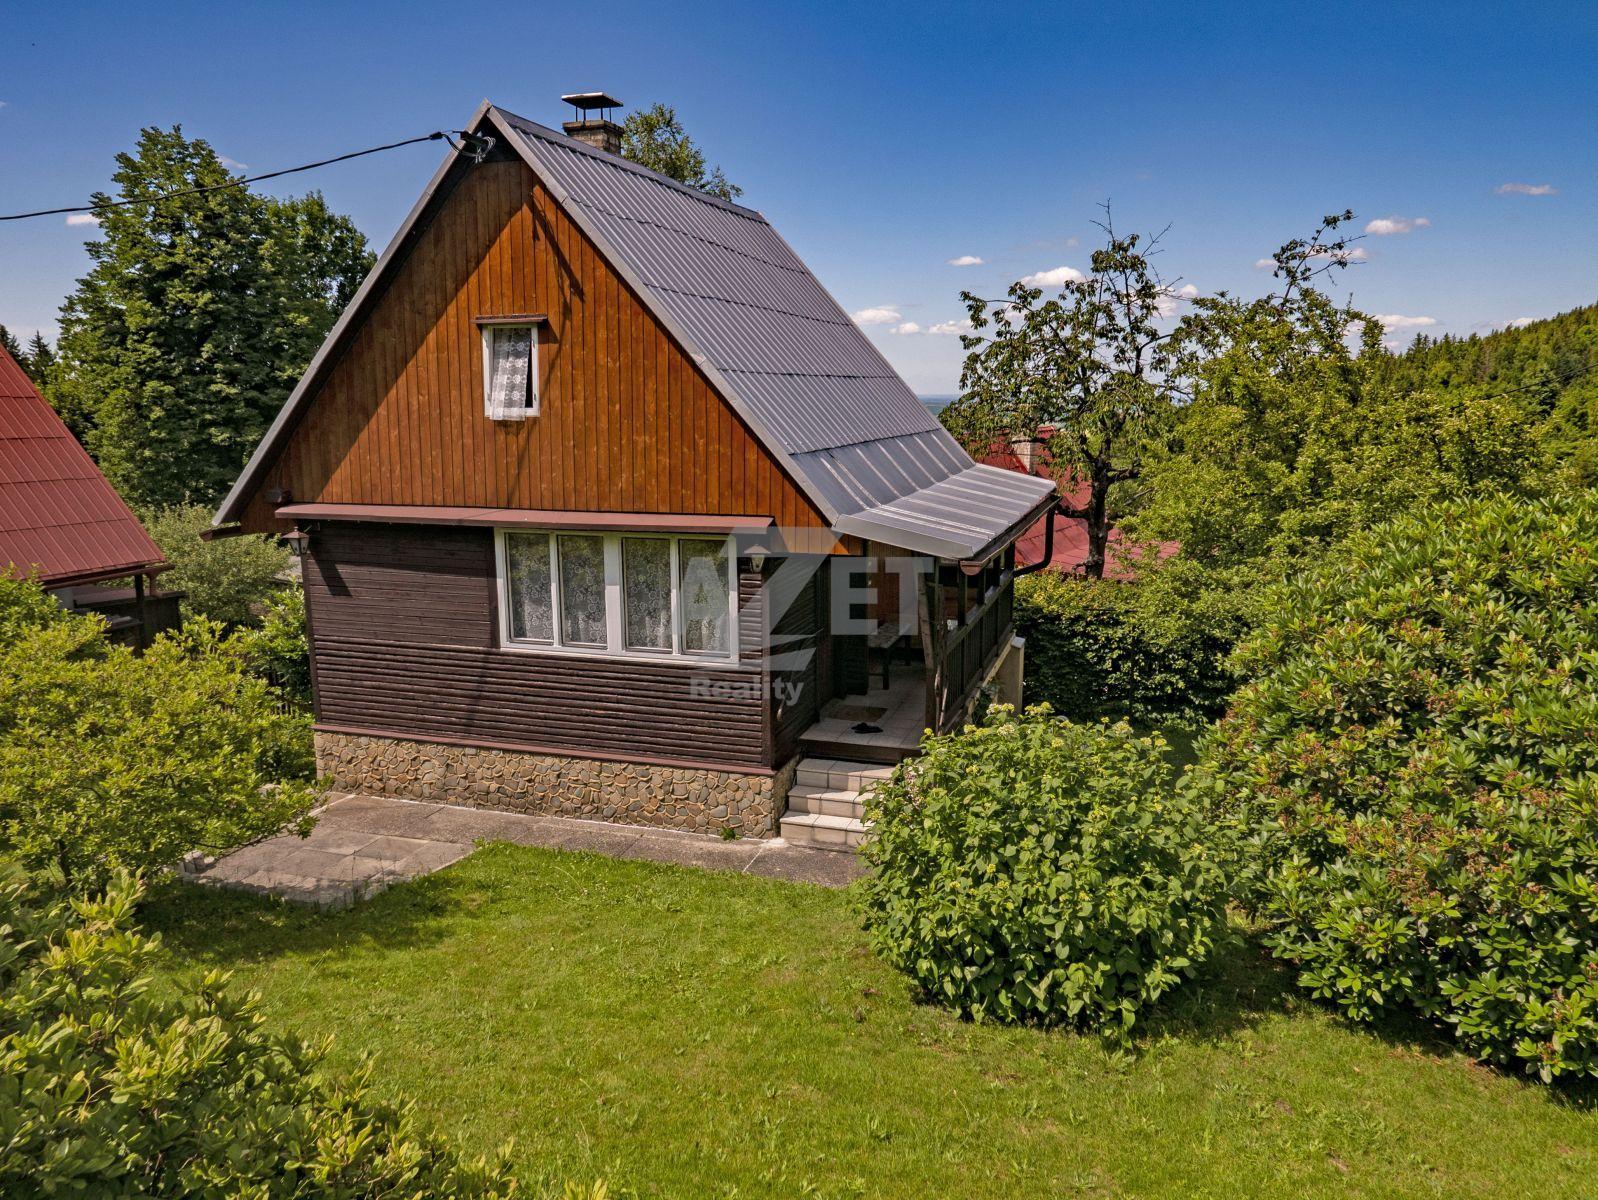 Prodej, chata 3+kk, 60 m2, Frýdlant nad Ostravicí, Lubno